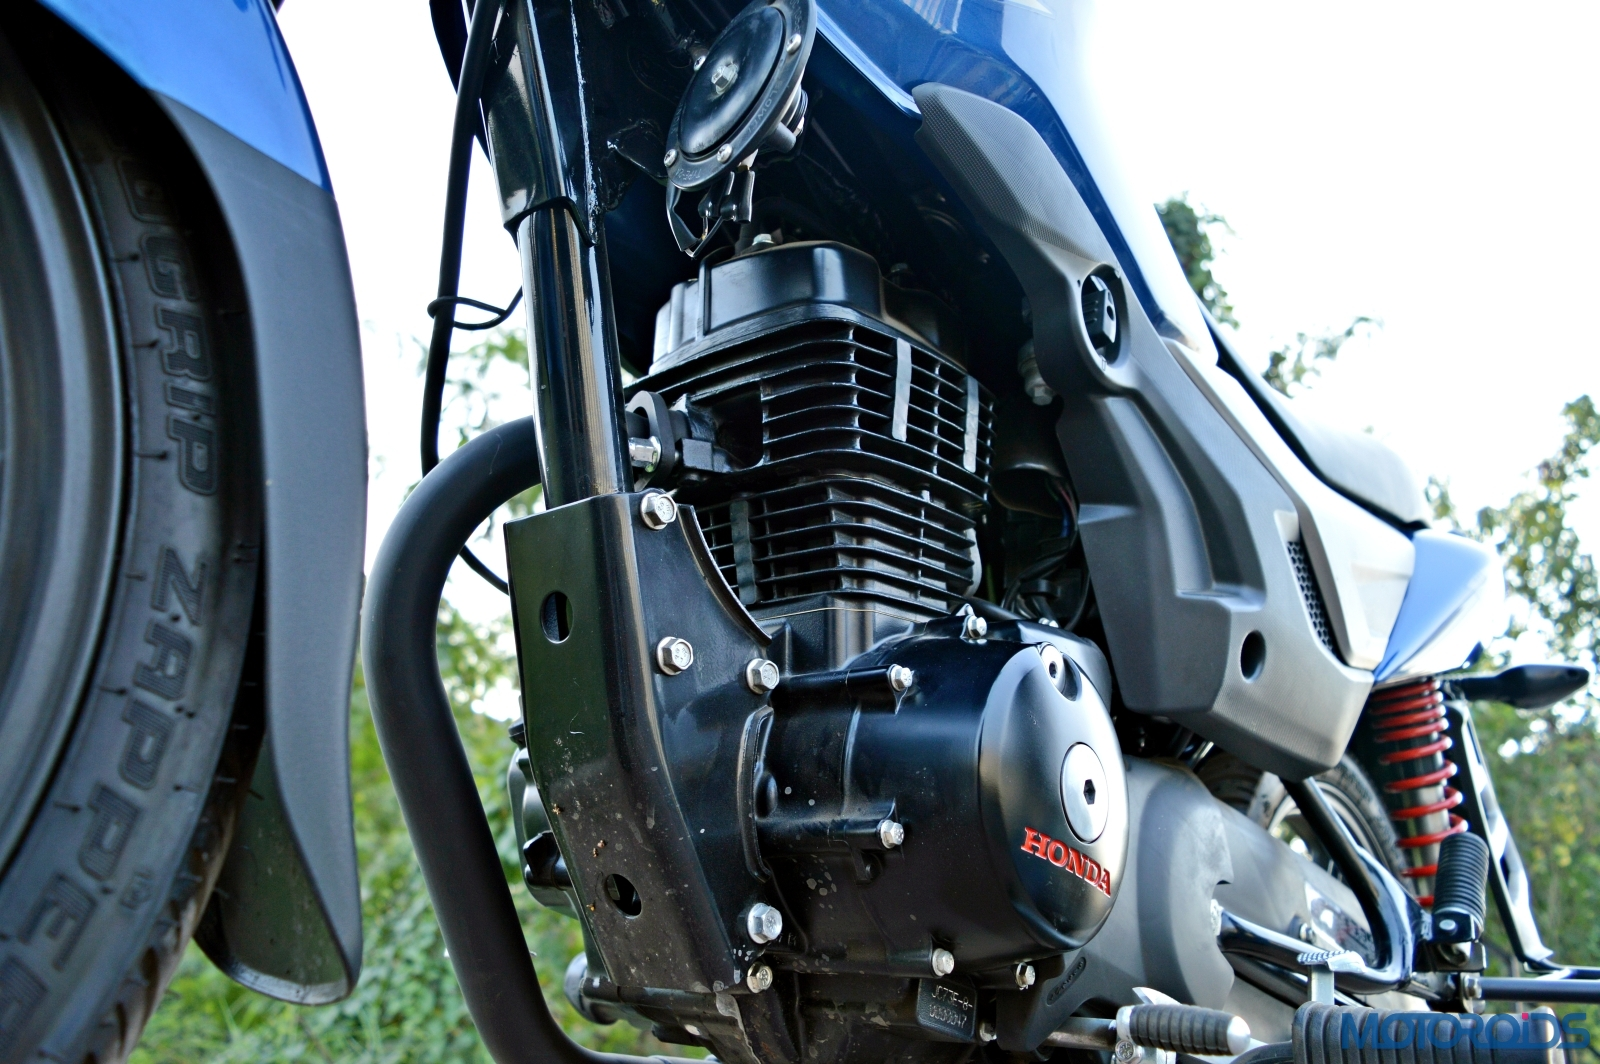 Honda CB Shine 125 SP review: Decked-up diligence | Motoroids